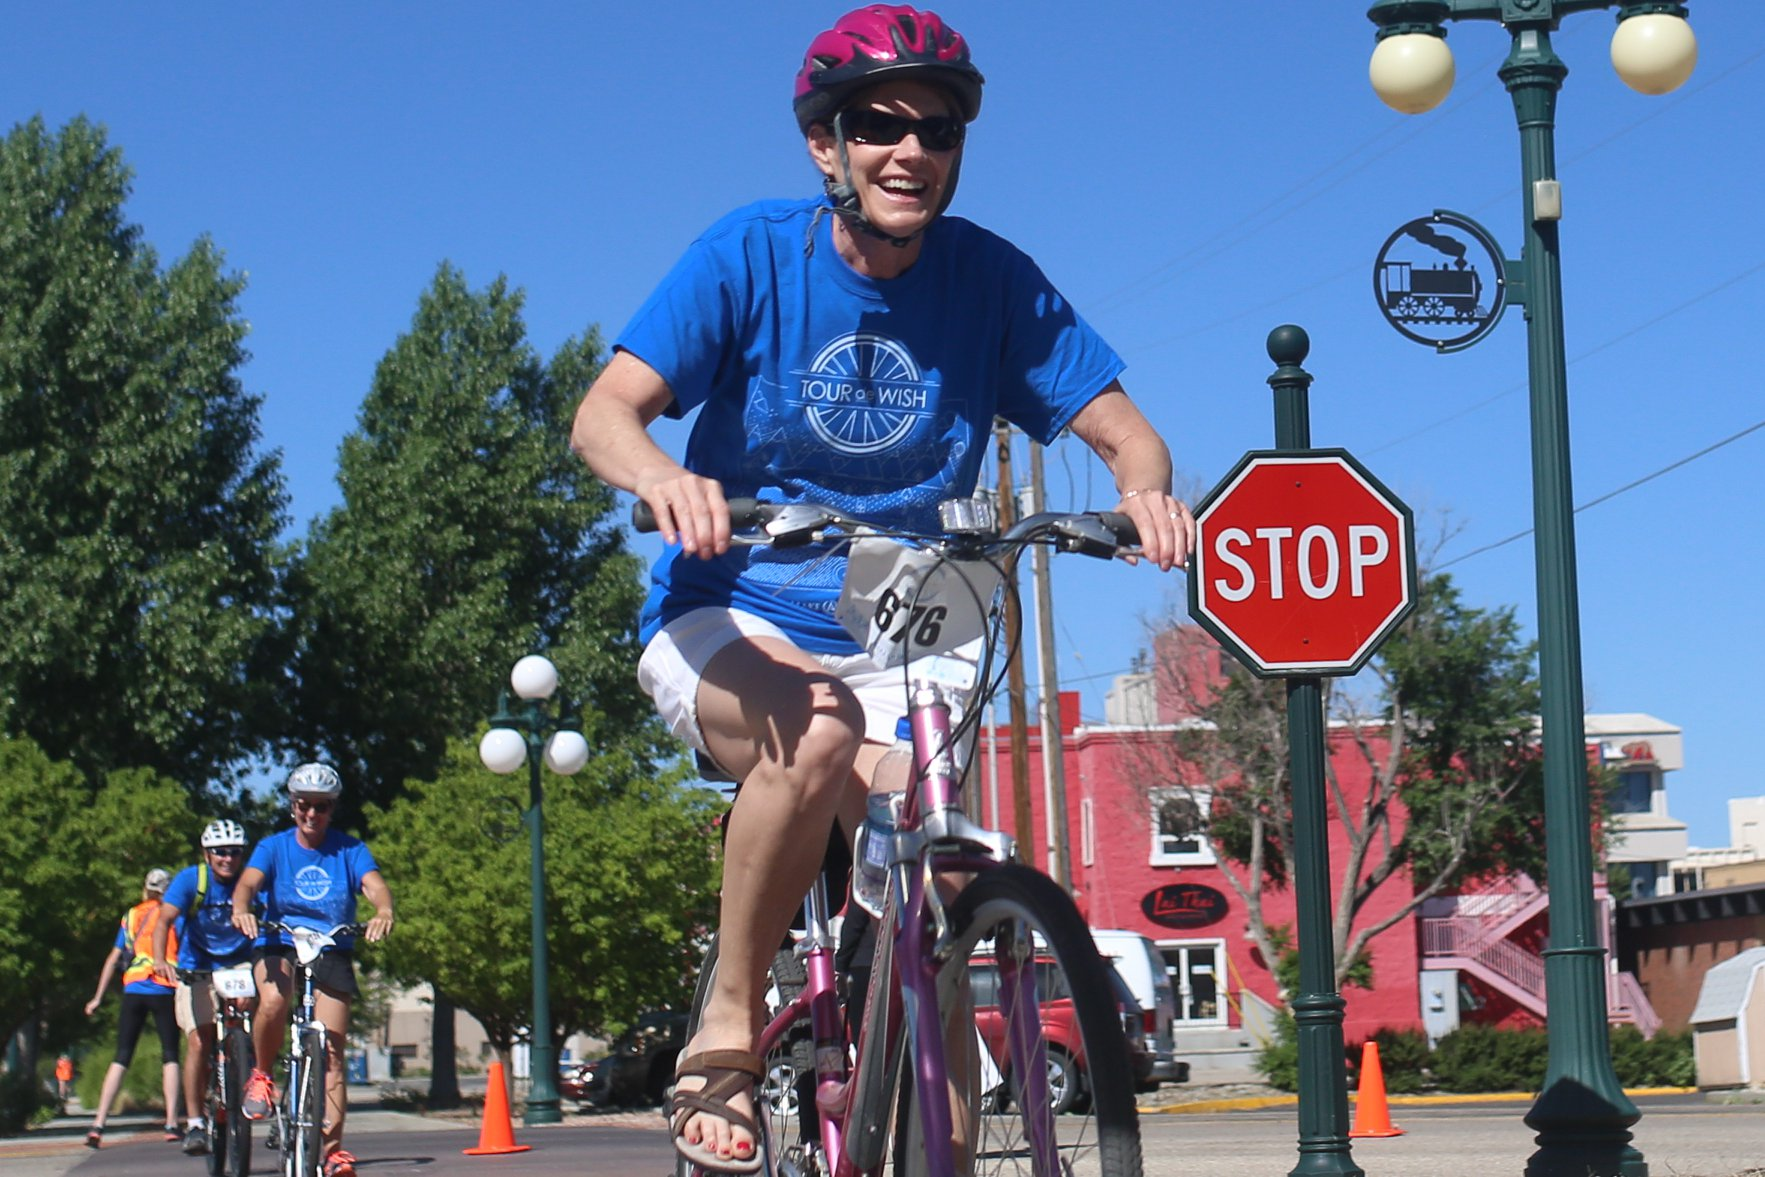 Rock Springs High School Hosts 5k Ride, Run, Walk Fundraiser for Make-A-Wish® Wyoming